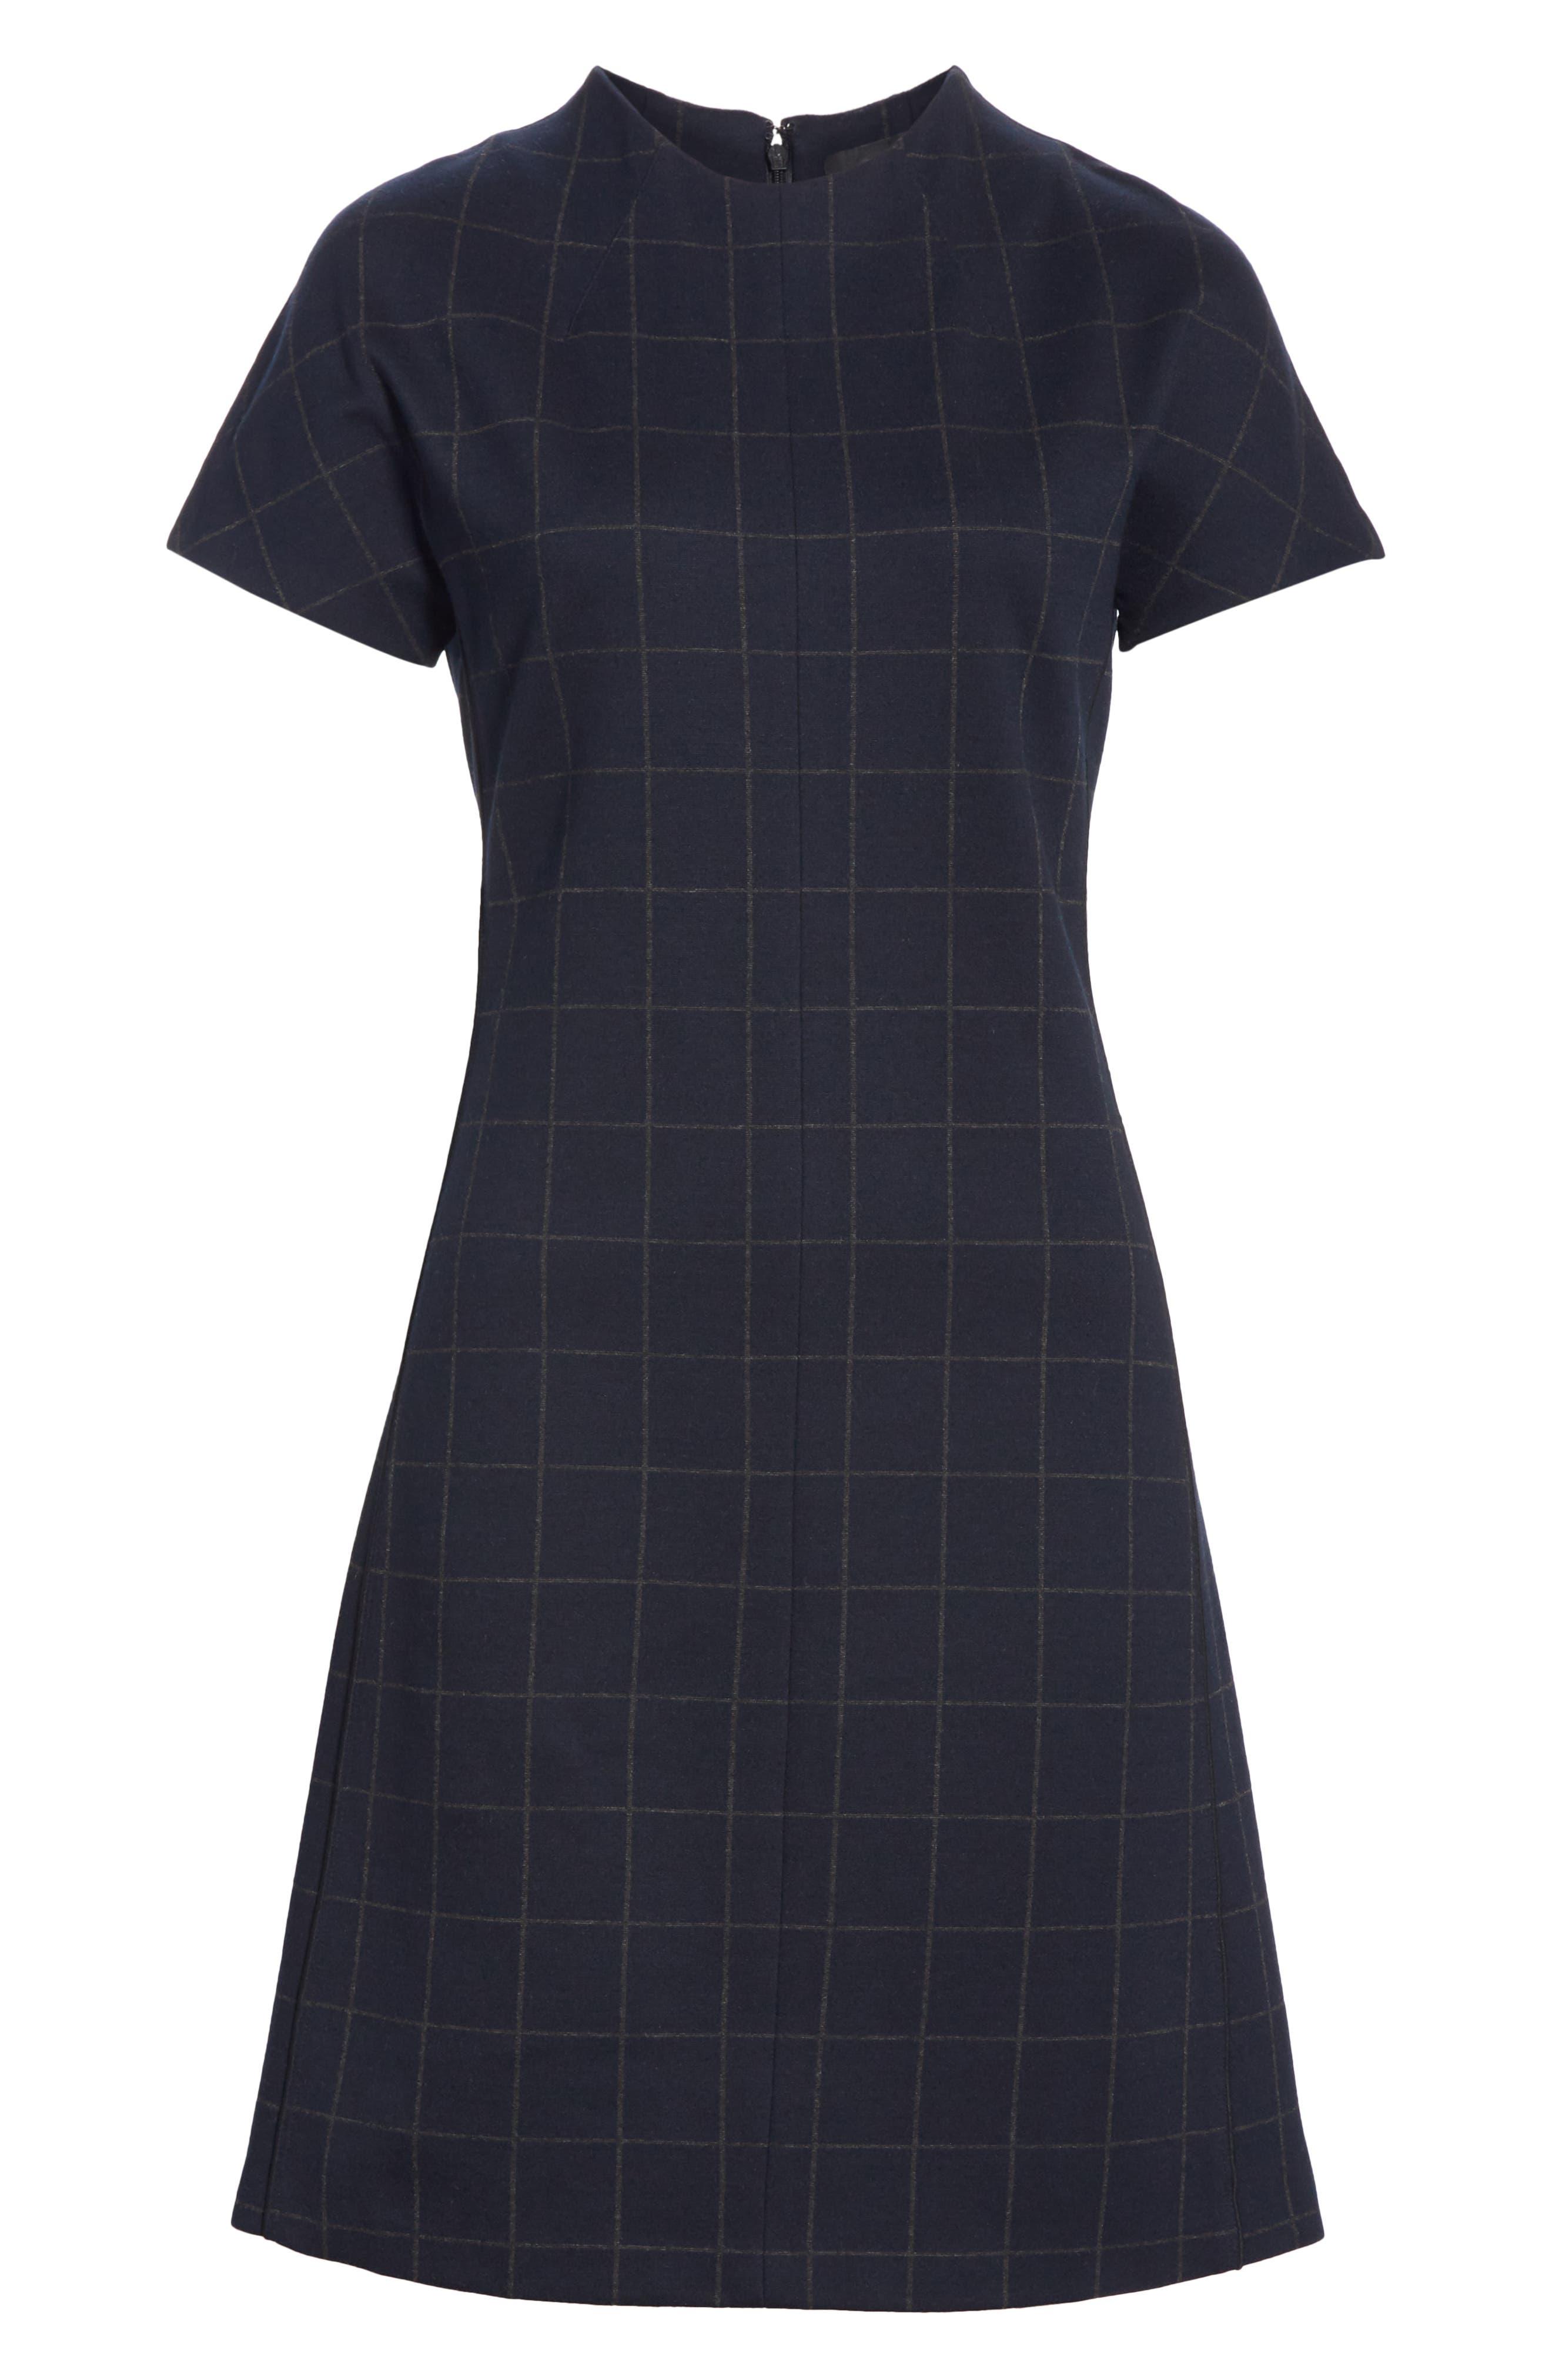 Windowpane Knit A-Line Dress,                             Alternate thumbnail 6, color,                             DEEP NAVY/ CHARCOAL MELANGE